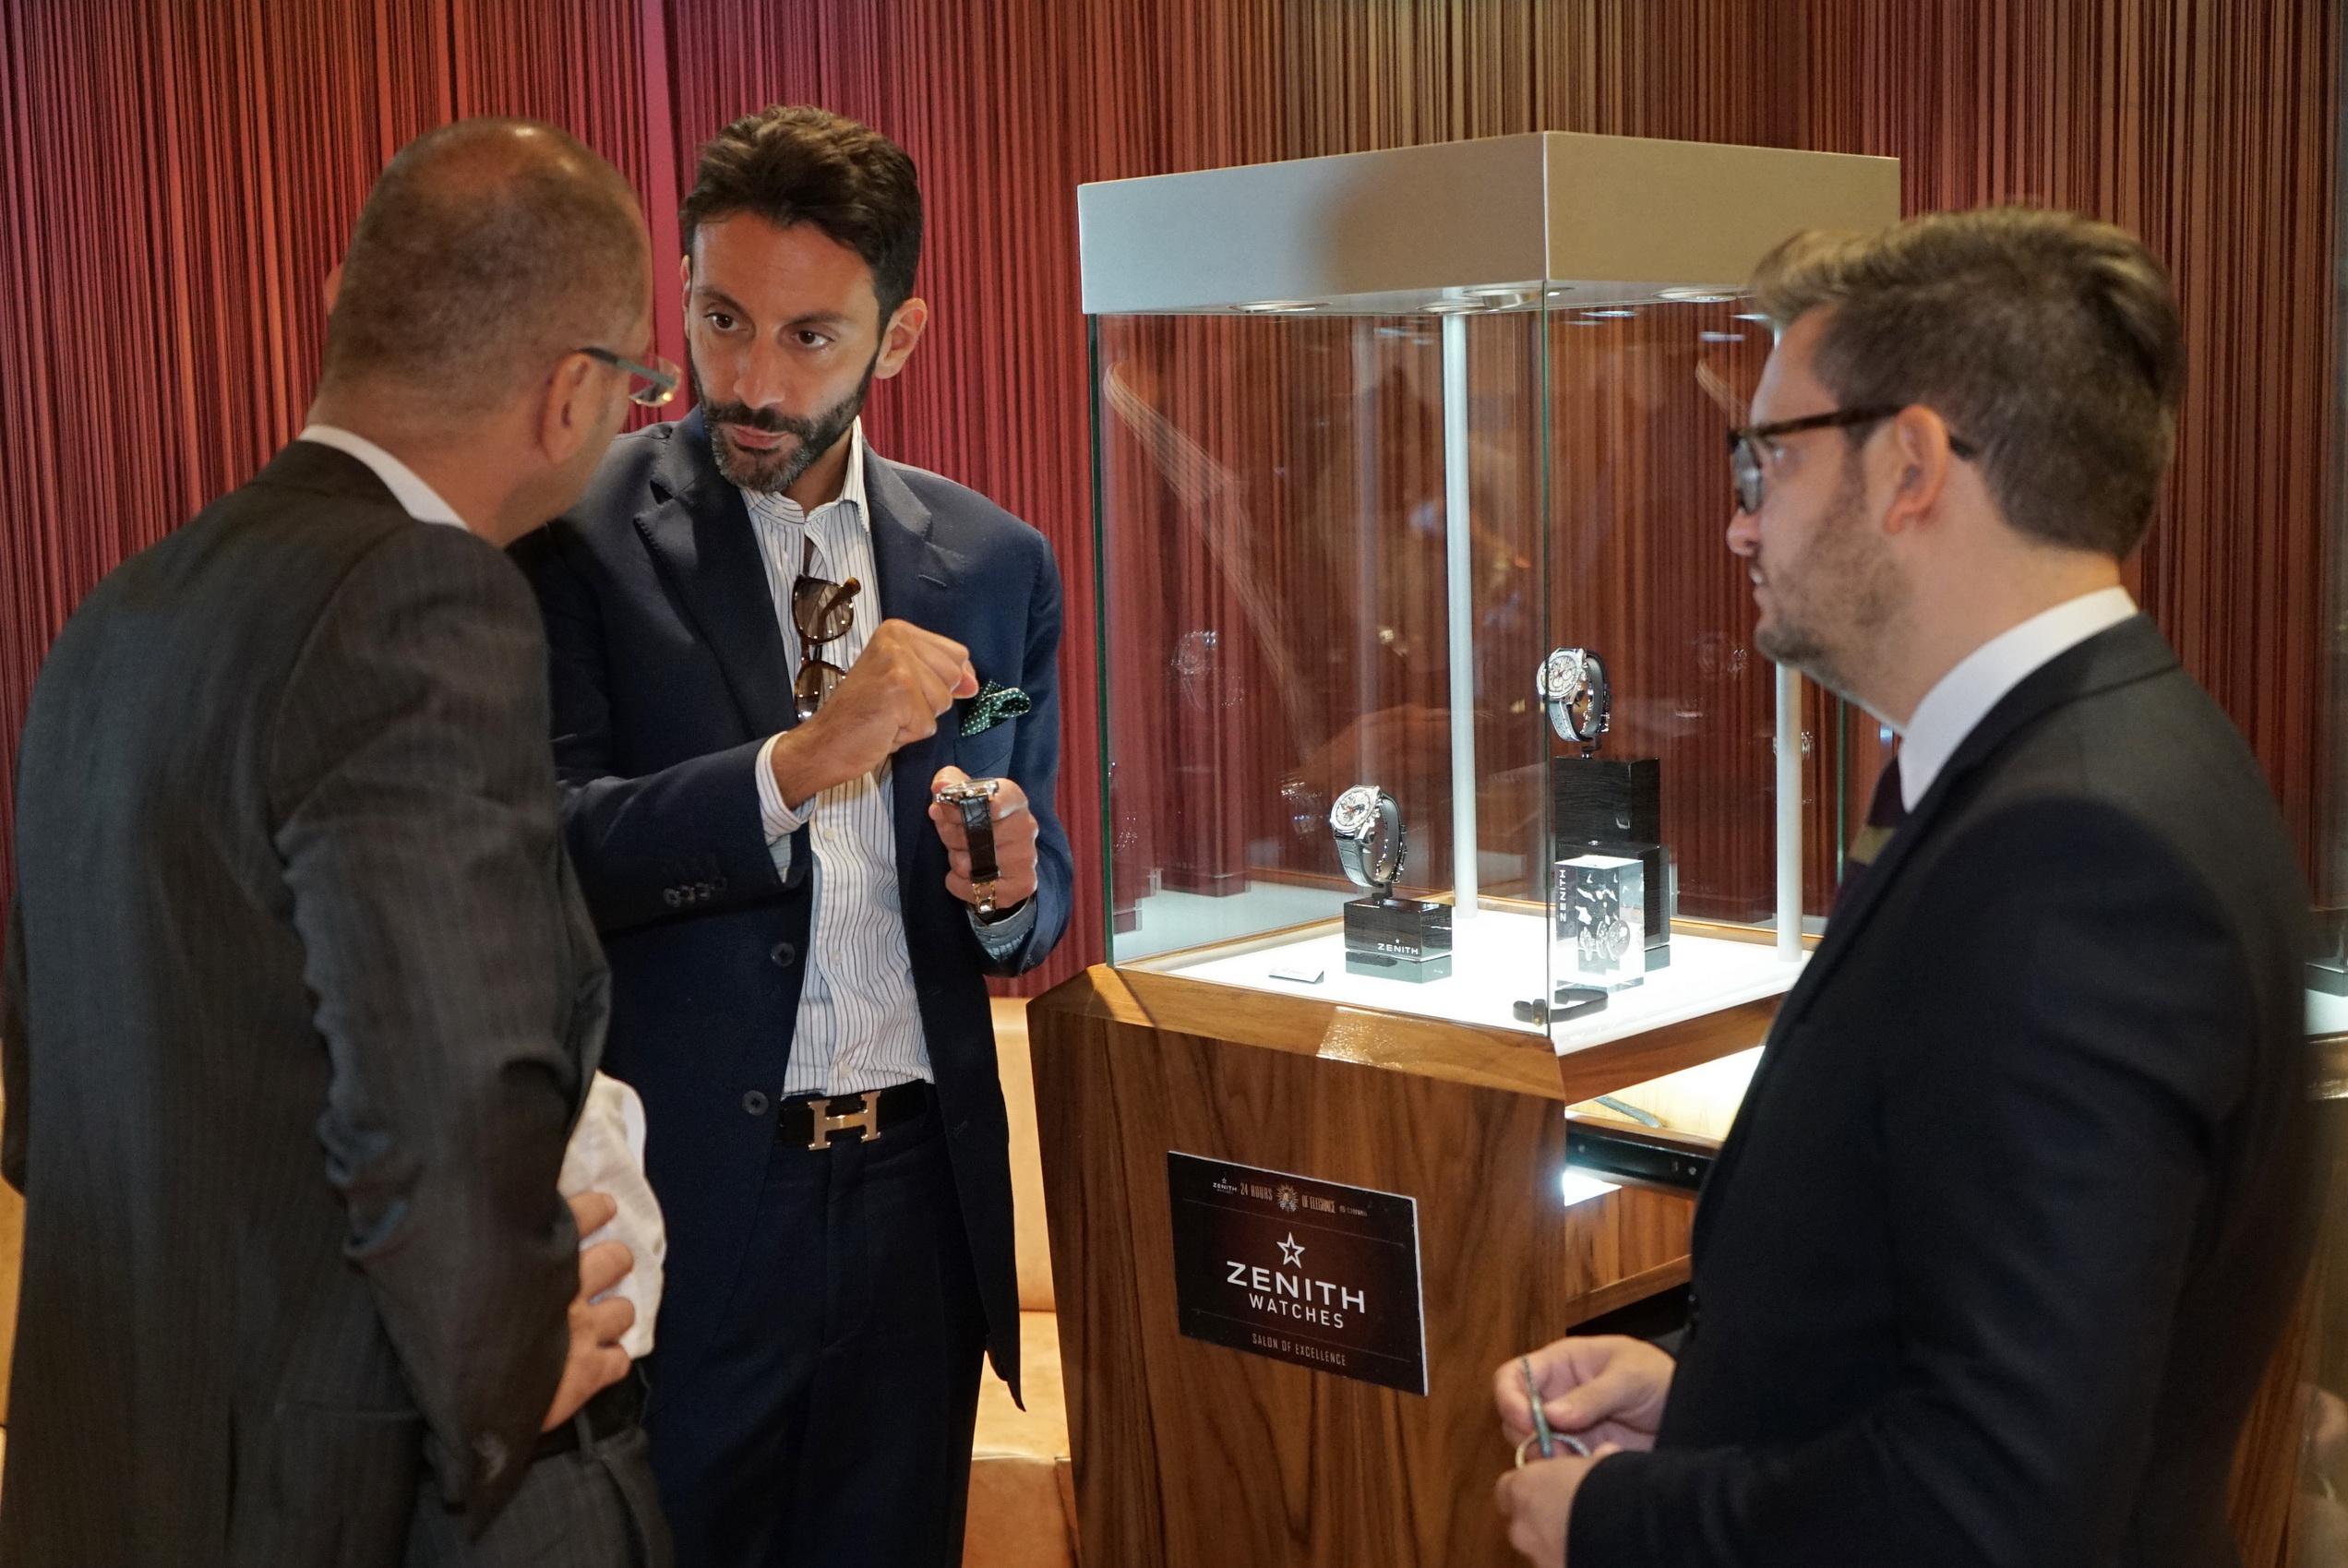 Paolo Cappiello i Vincent Steinmann predstavljaju ZENITH vrhunske casovnike